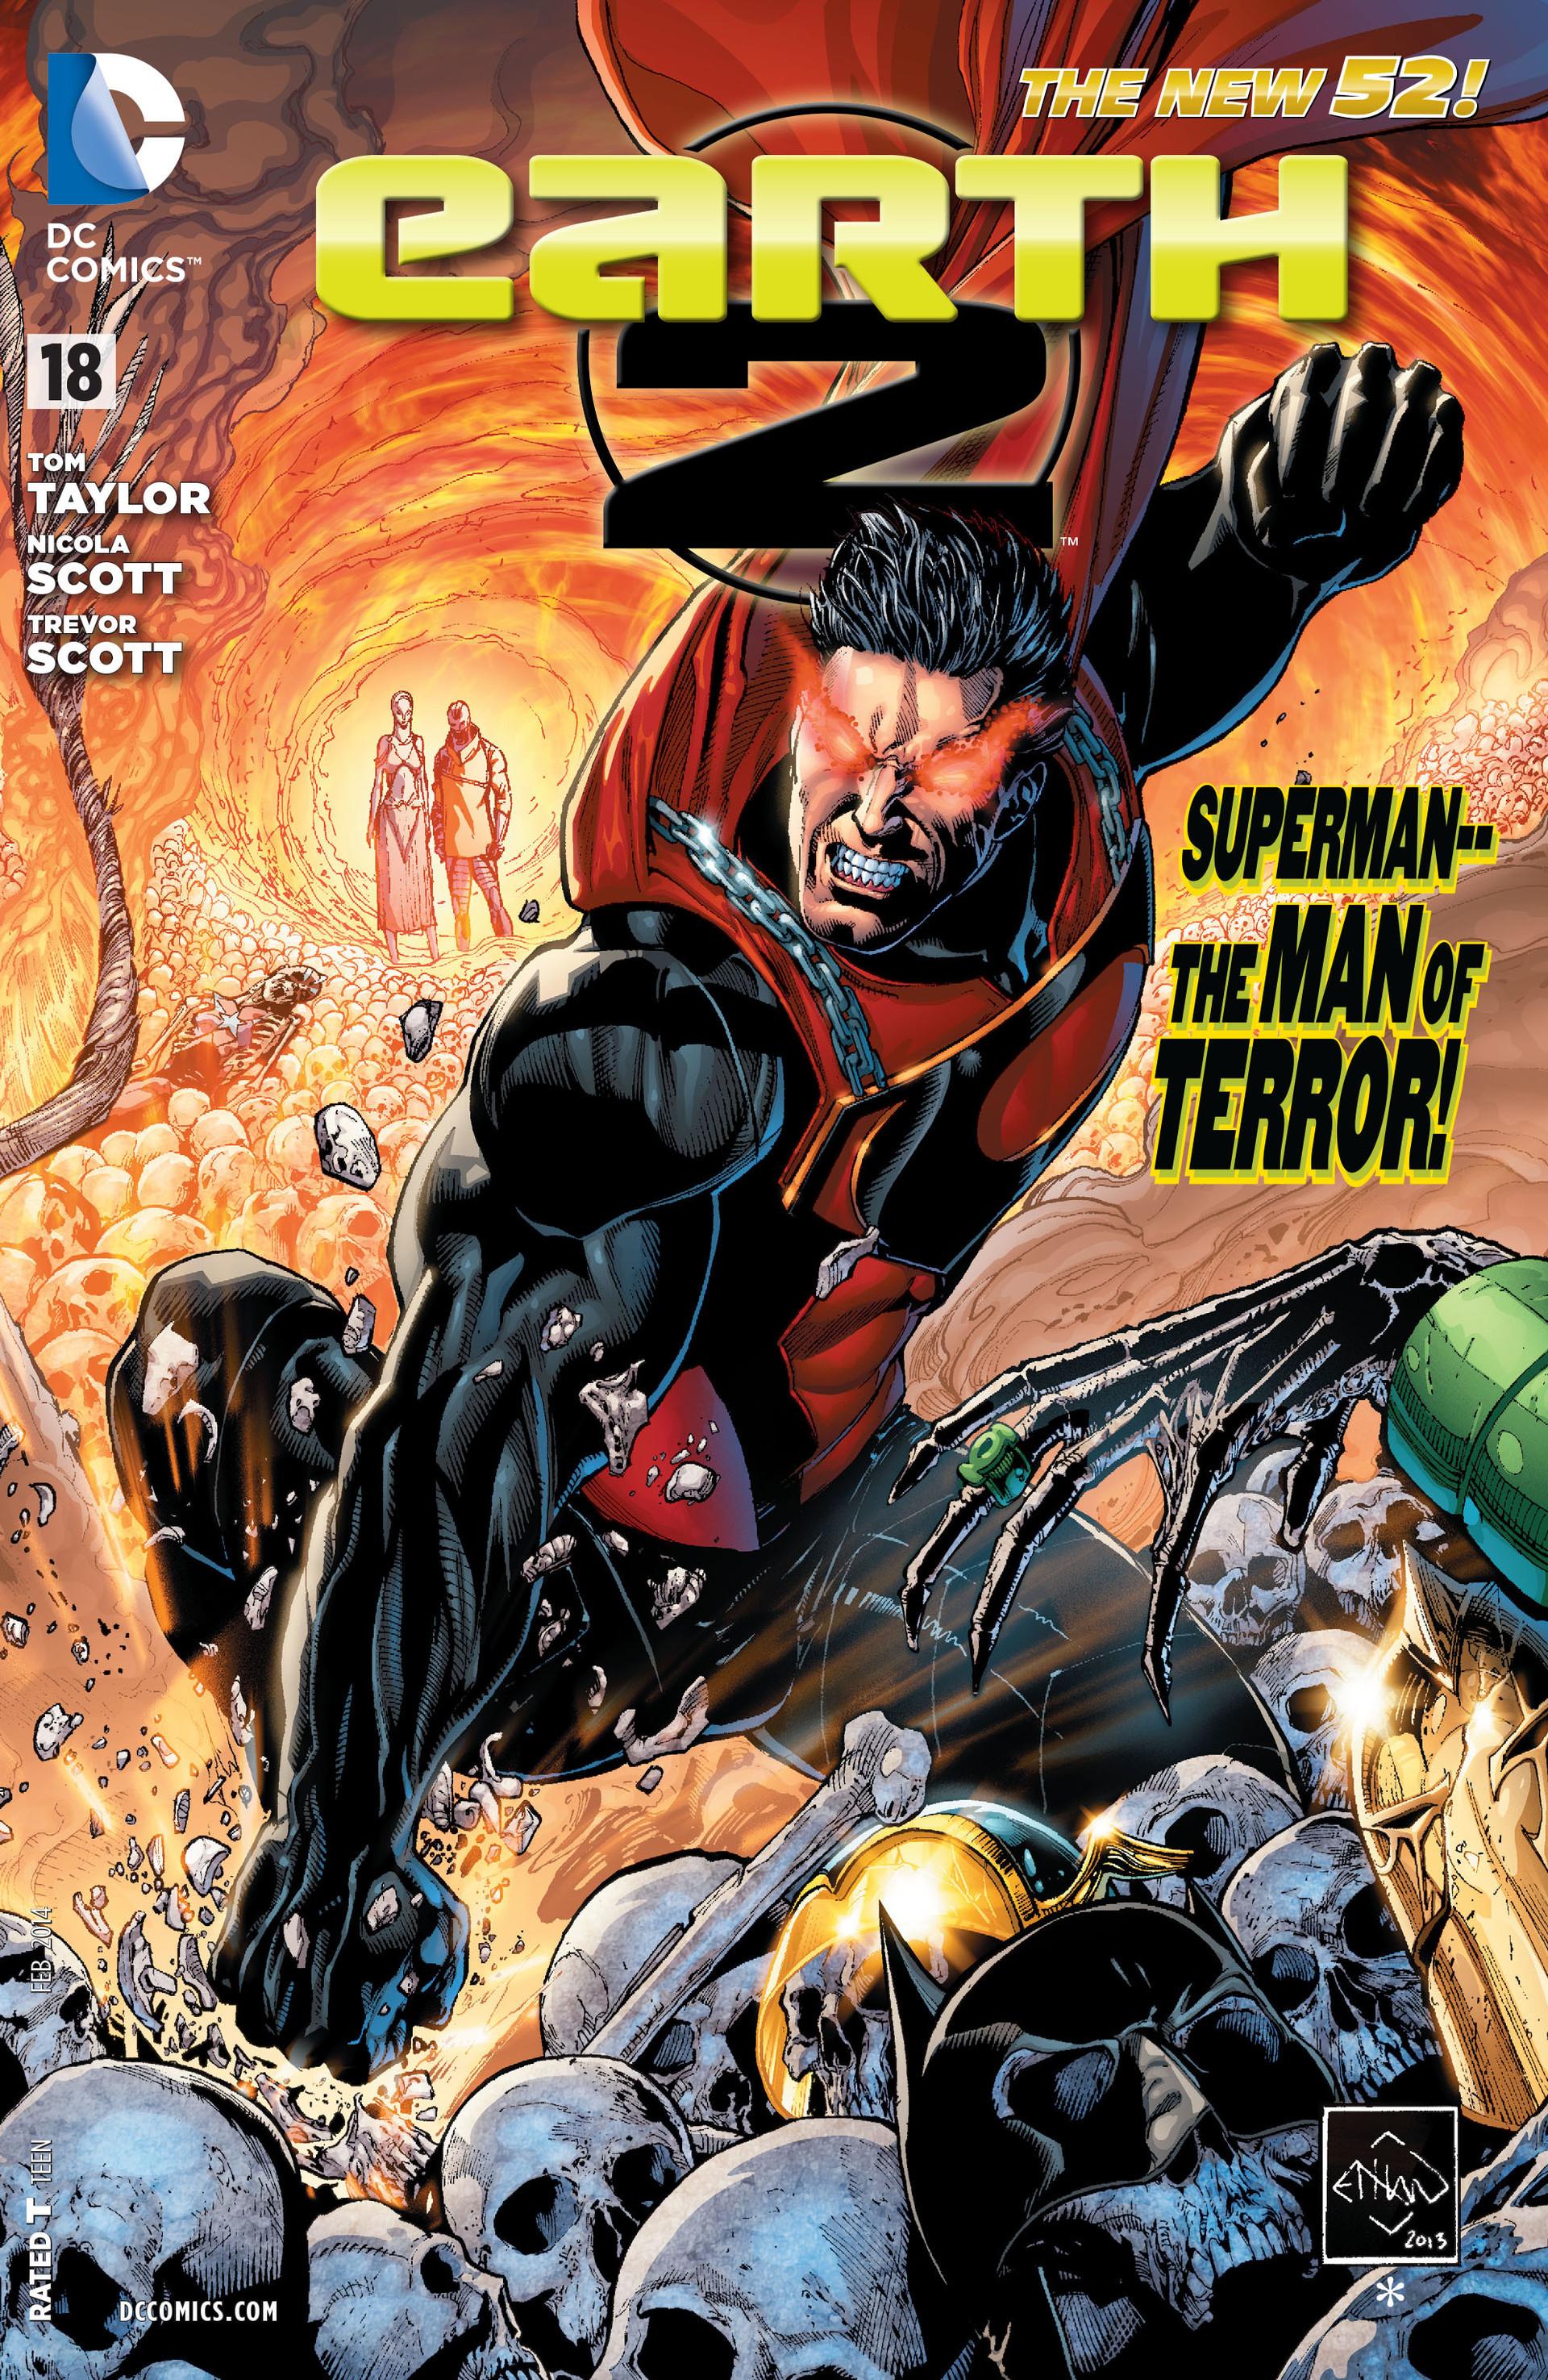 earth 2 volume 1 issue 18 batman wiki fandom powered